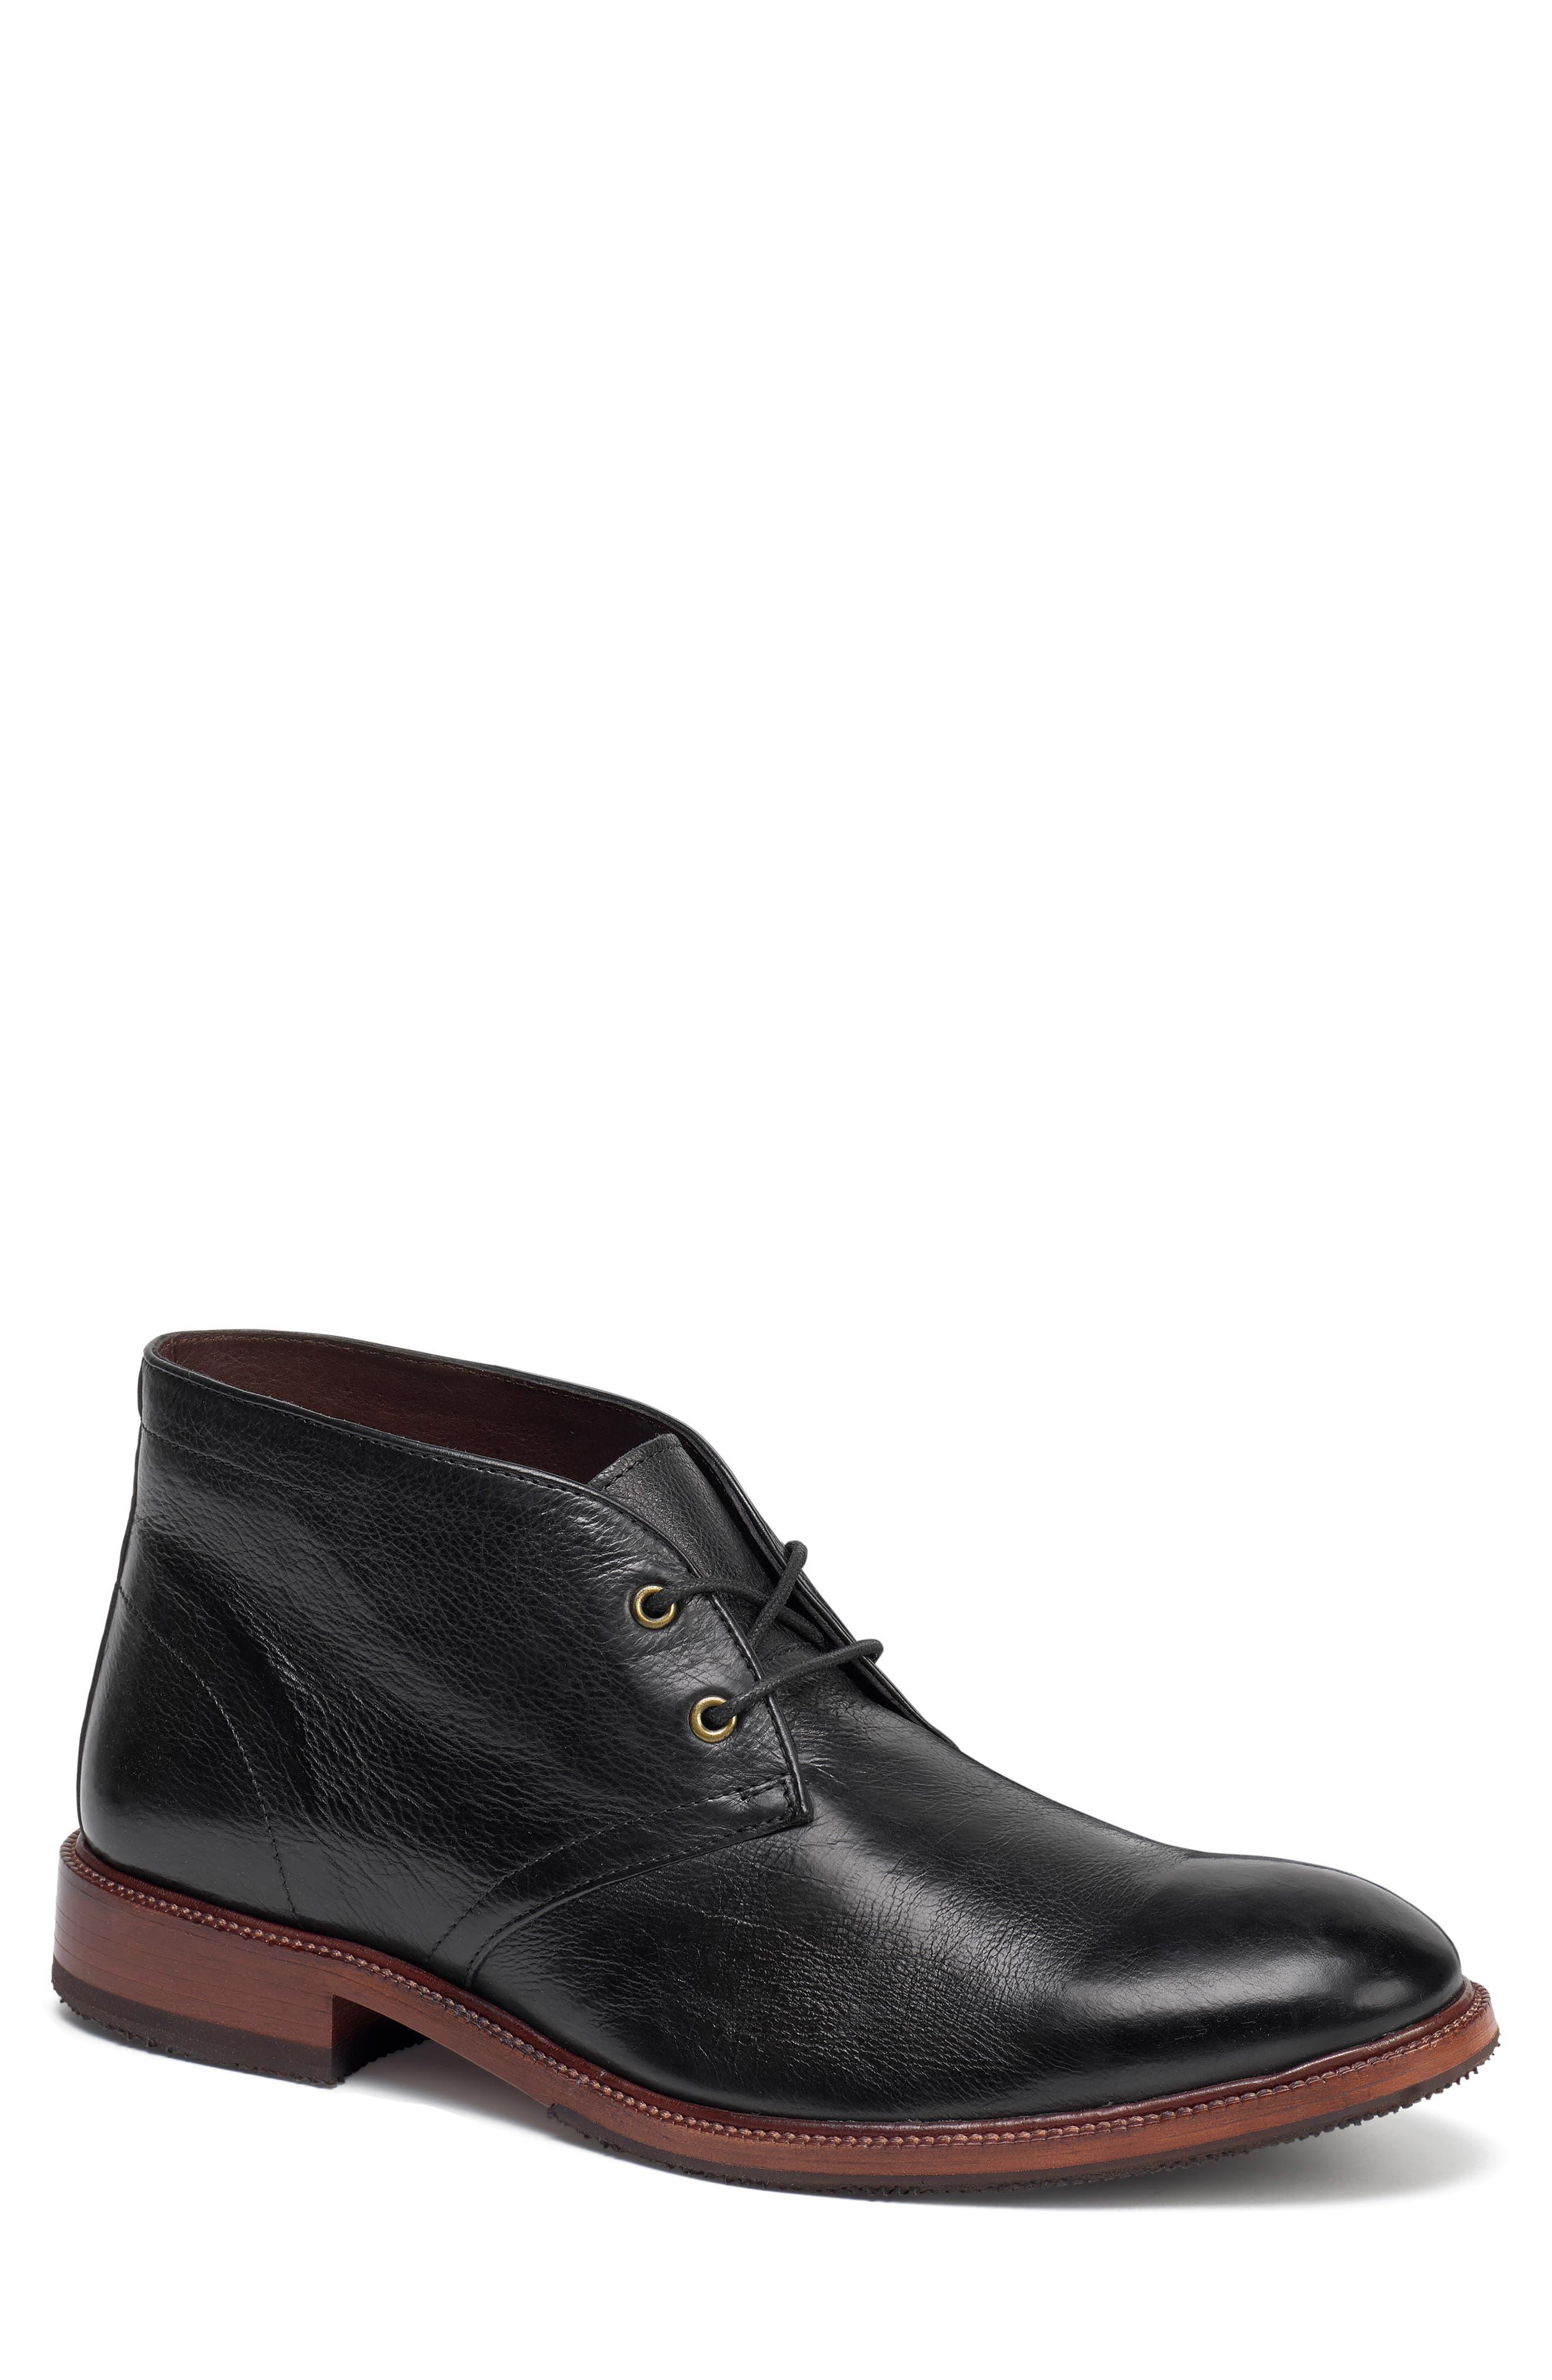 Trask Landers Chukka Boot, Black